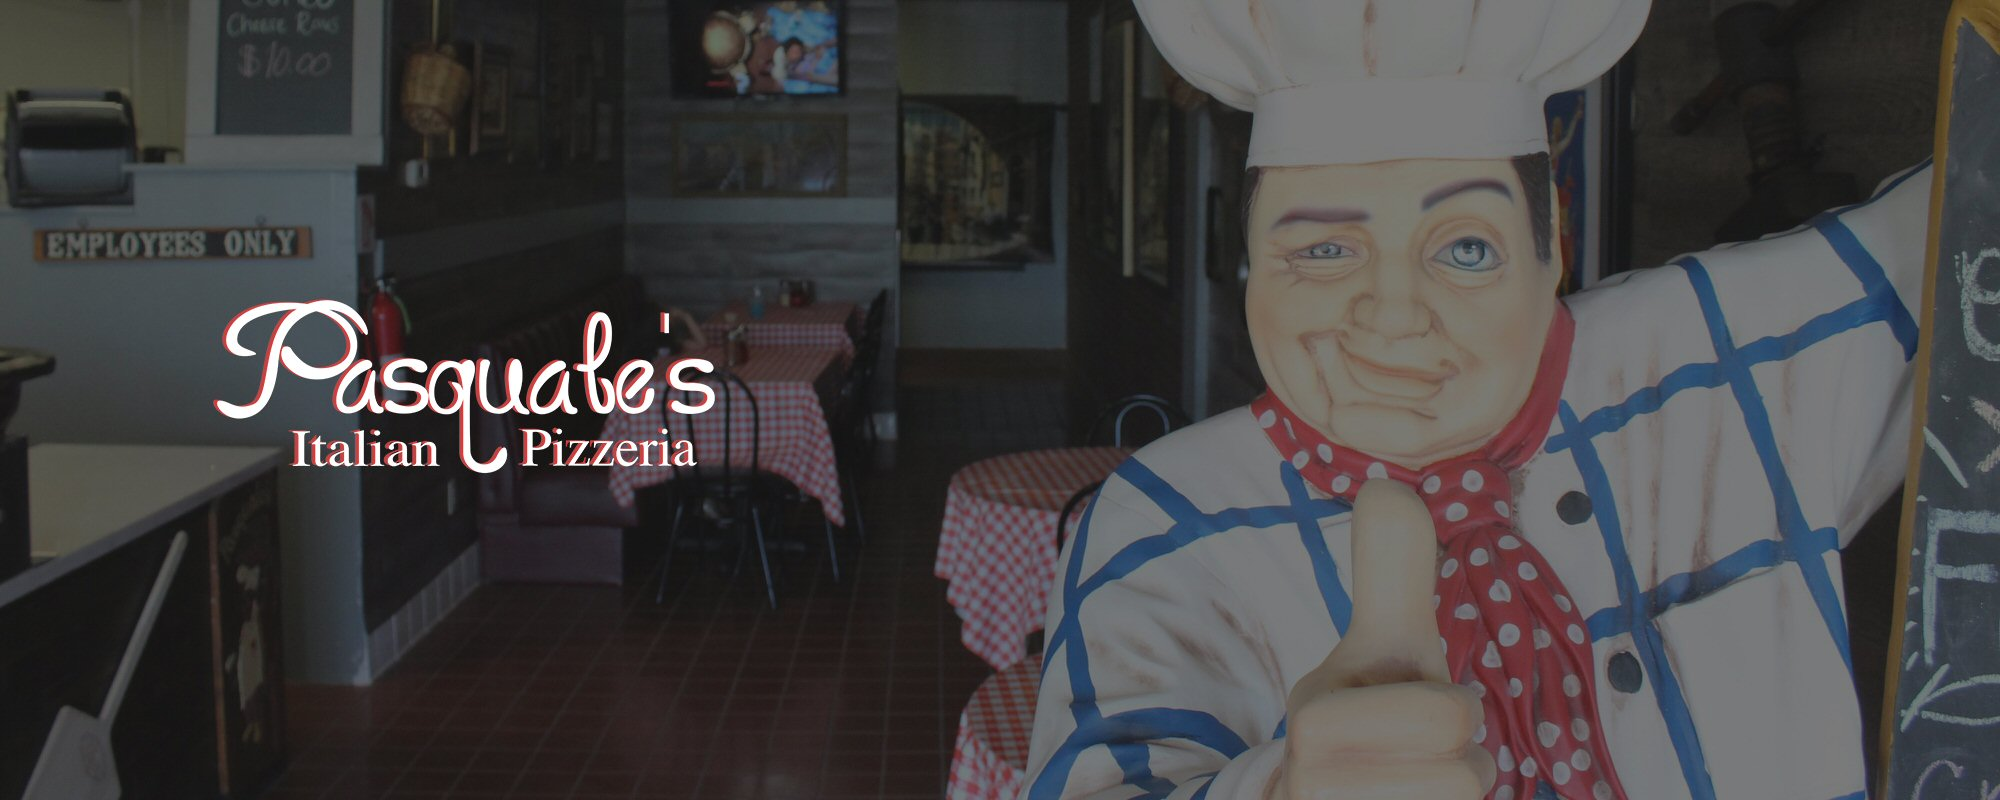 Pasquale's Italian Pizzeria